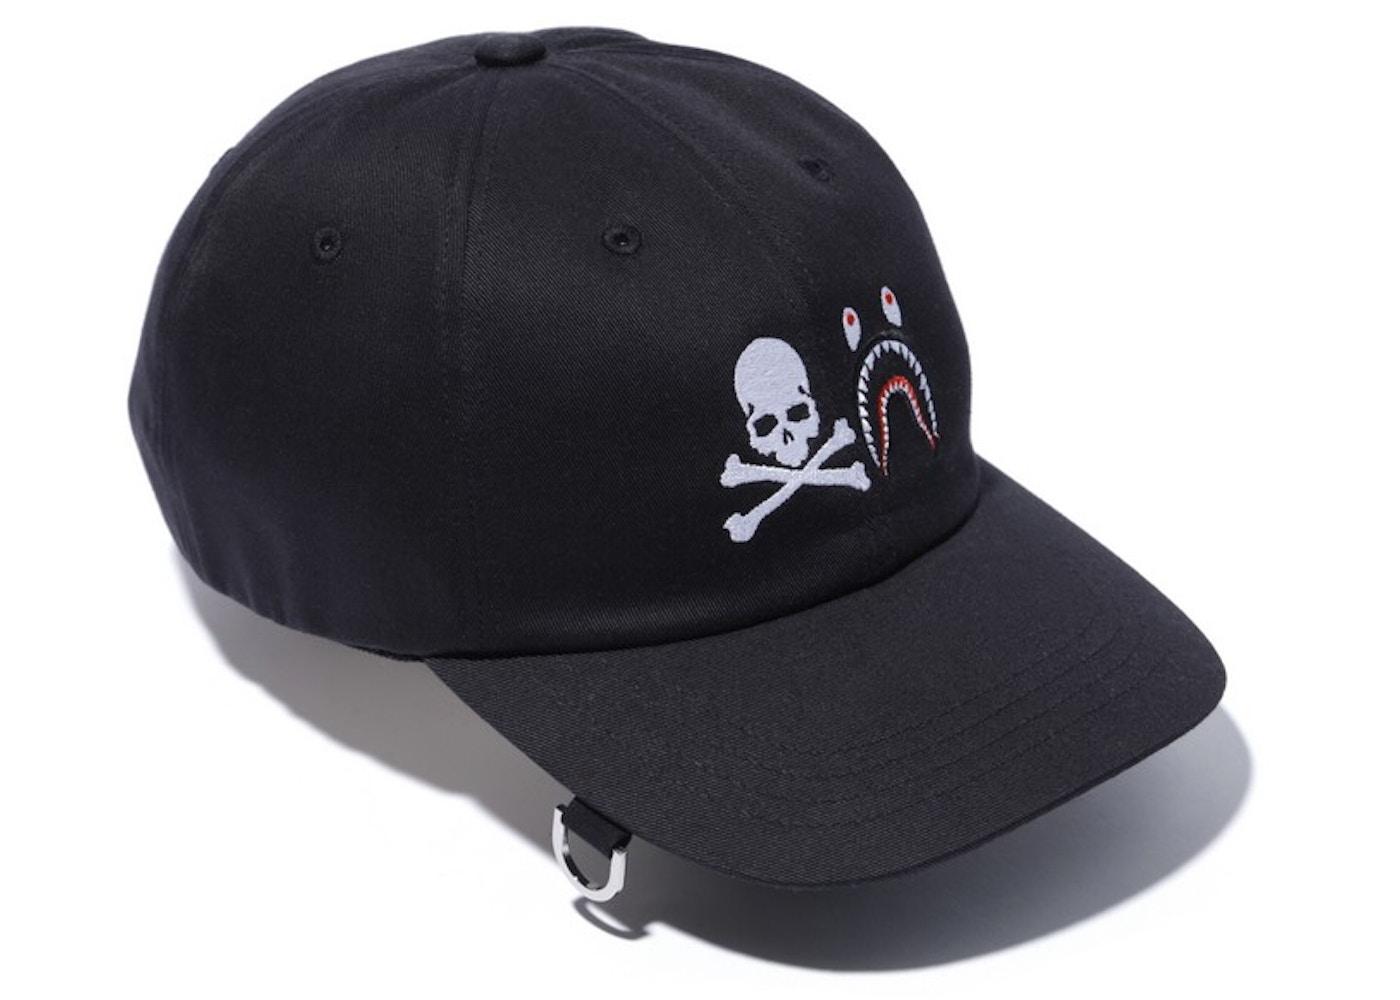 e72a2db8893 Streetwear - Bape Headwear - Highest Bid